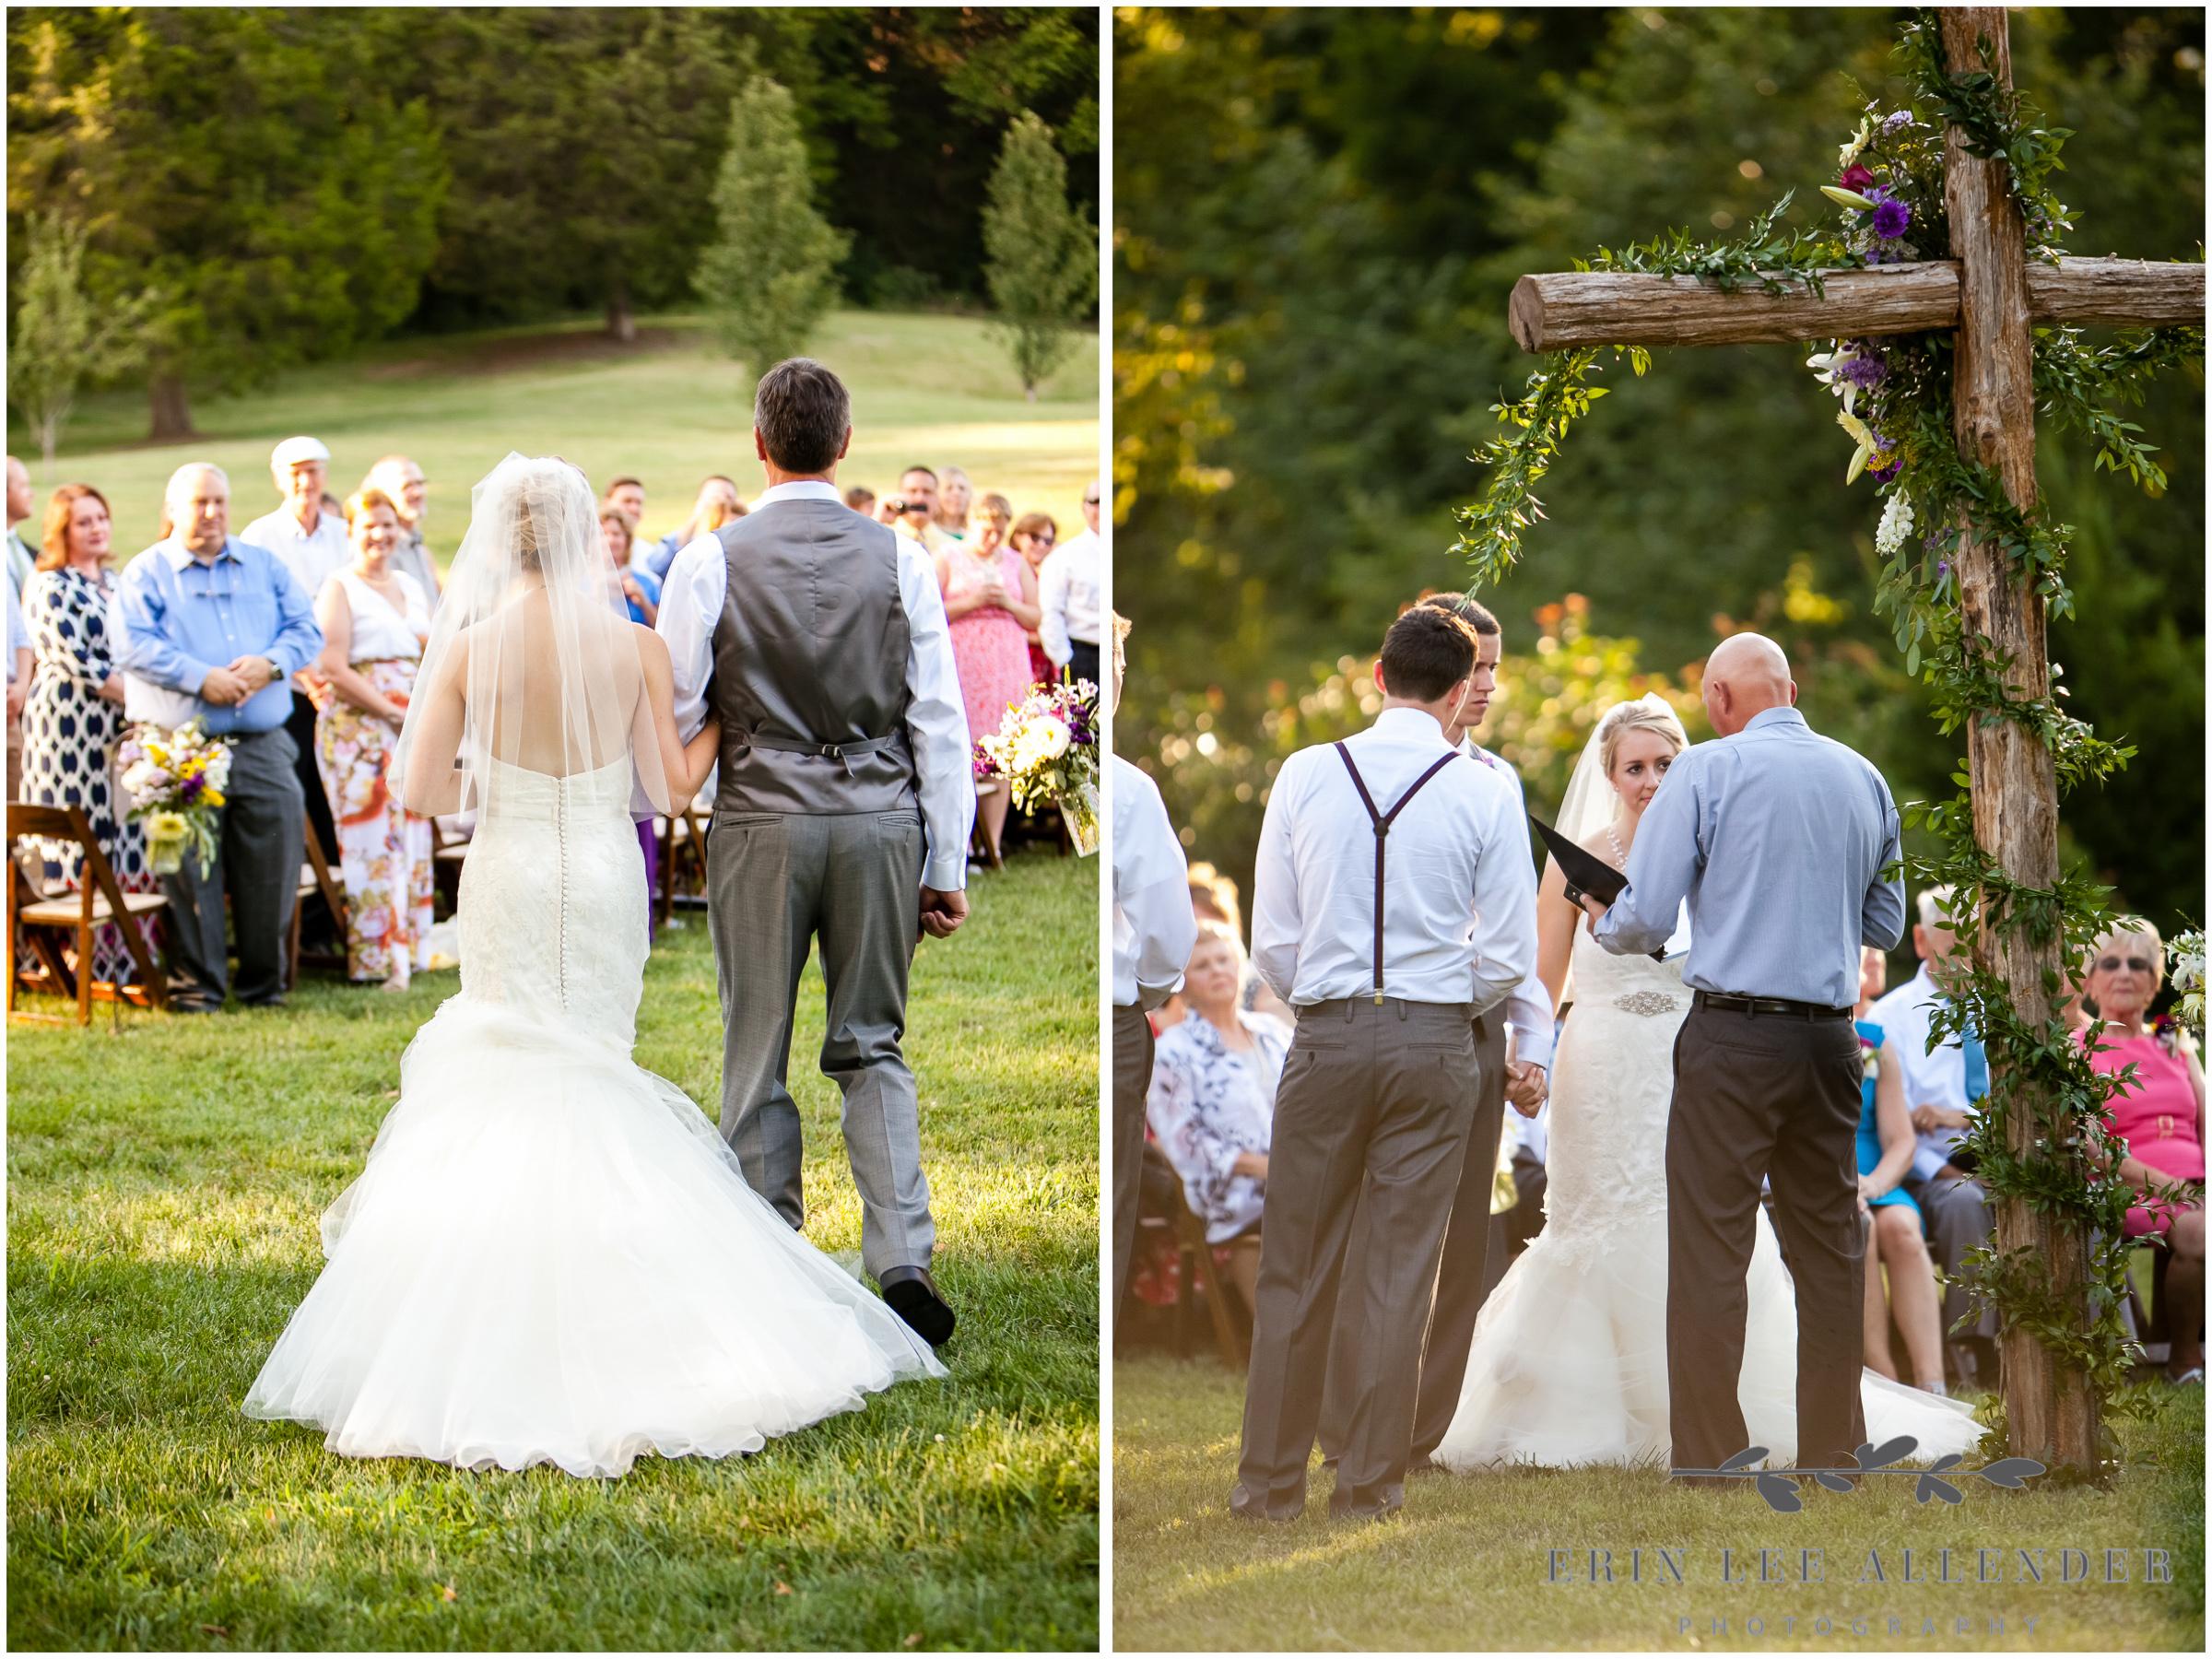 Ceremony_Cross_Backdrop